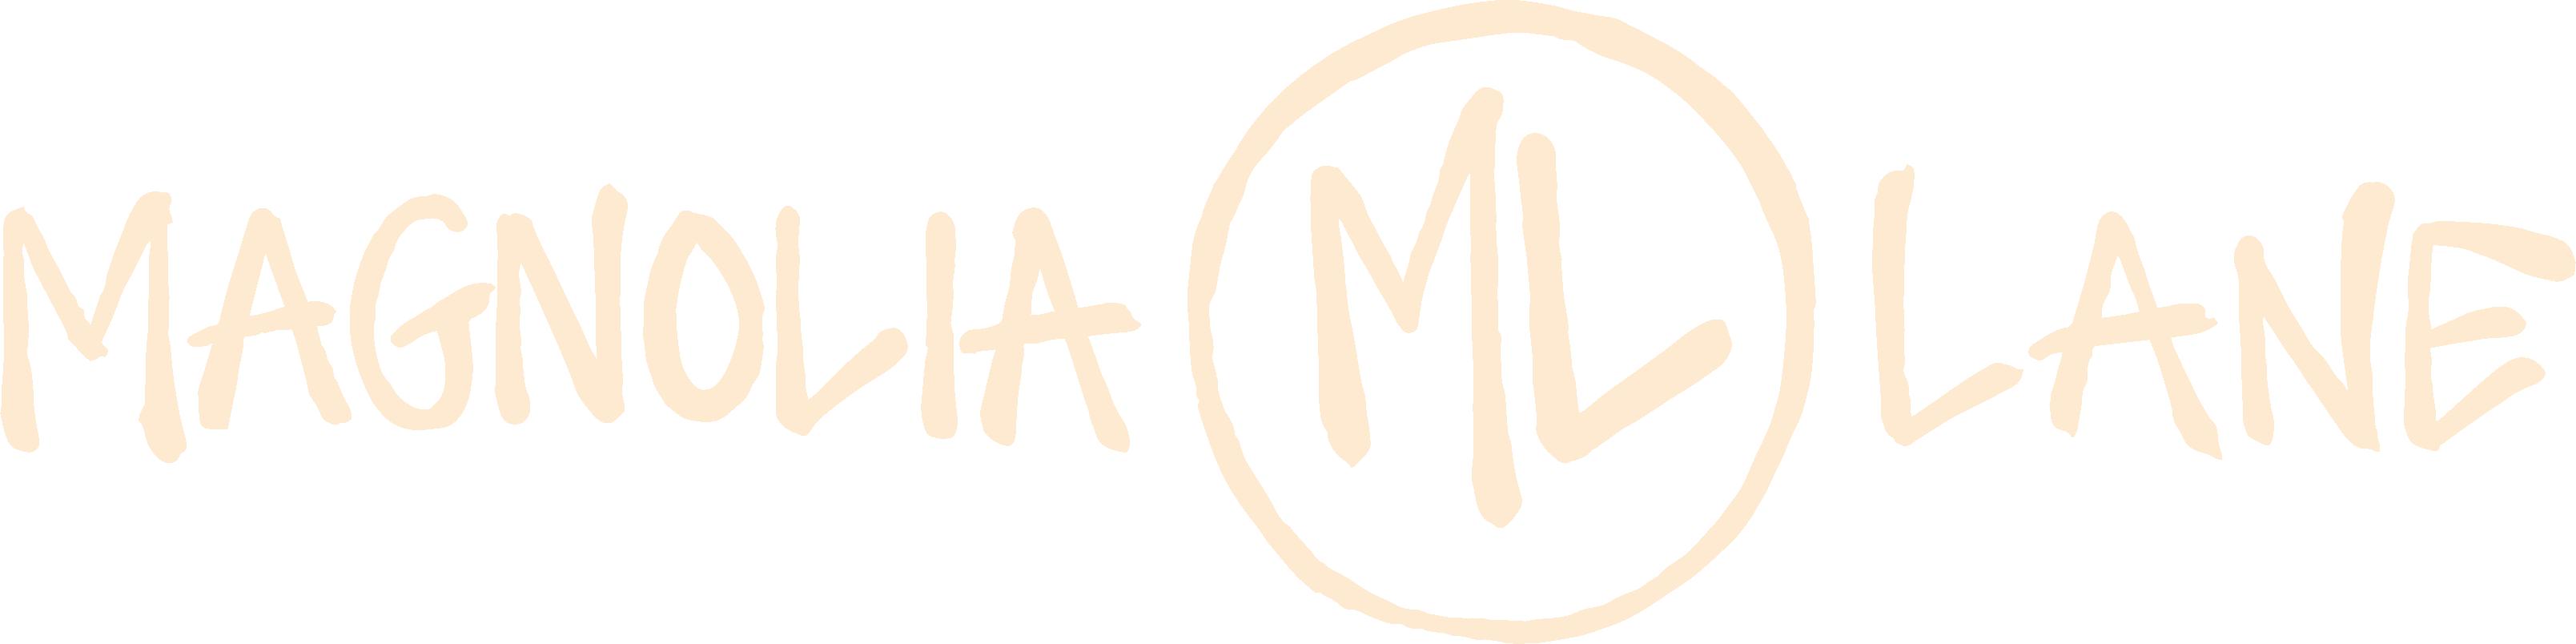 Magnolia Lane Logo